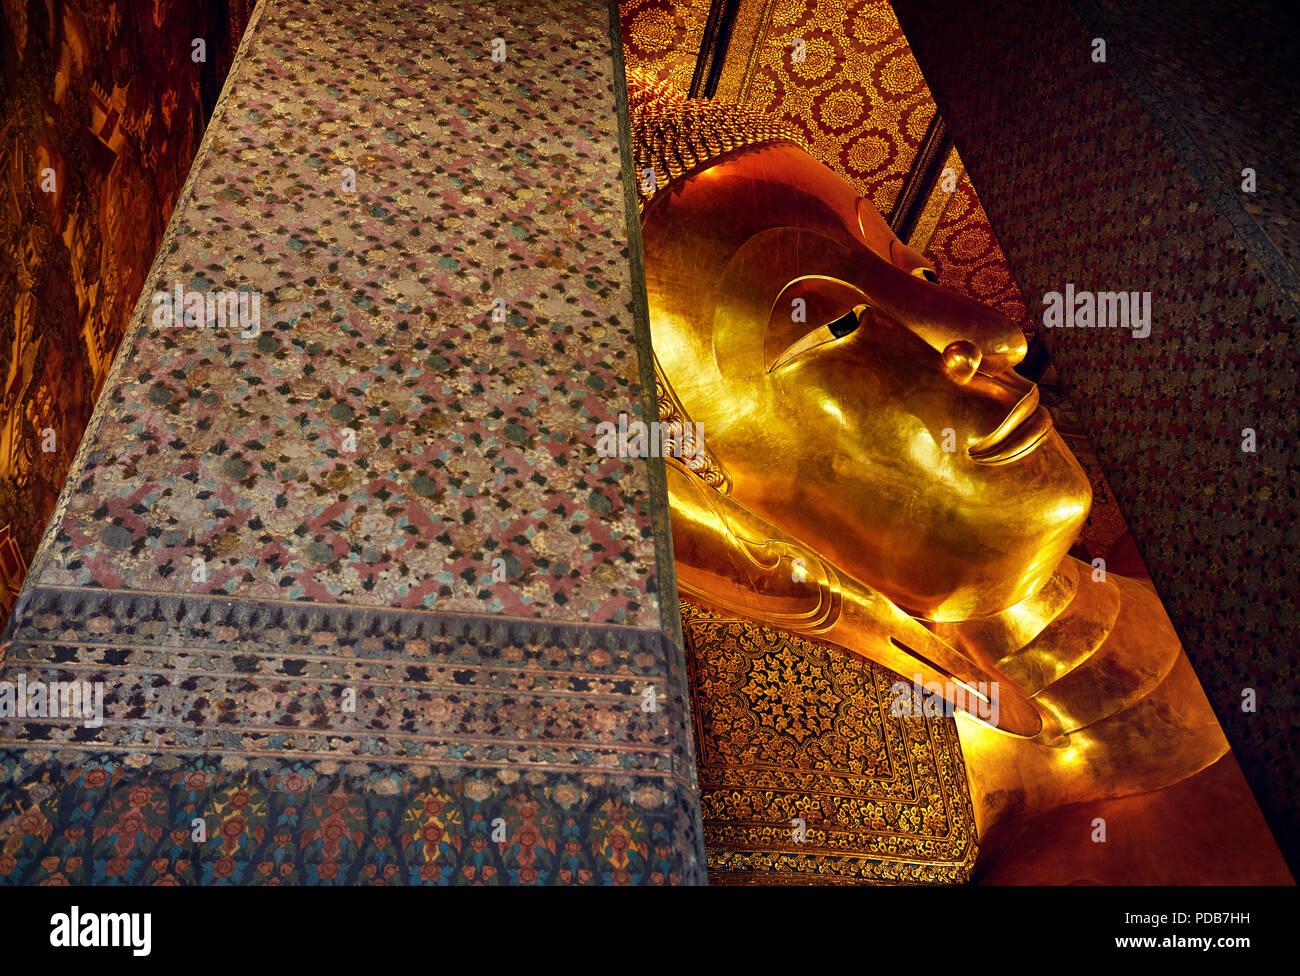 La famosa estatua del Gran Buda de Oro en el templo Wat Pho en Bangkok, Tailandia. Símbolo de la cultura budista. Foto de stock